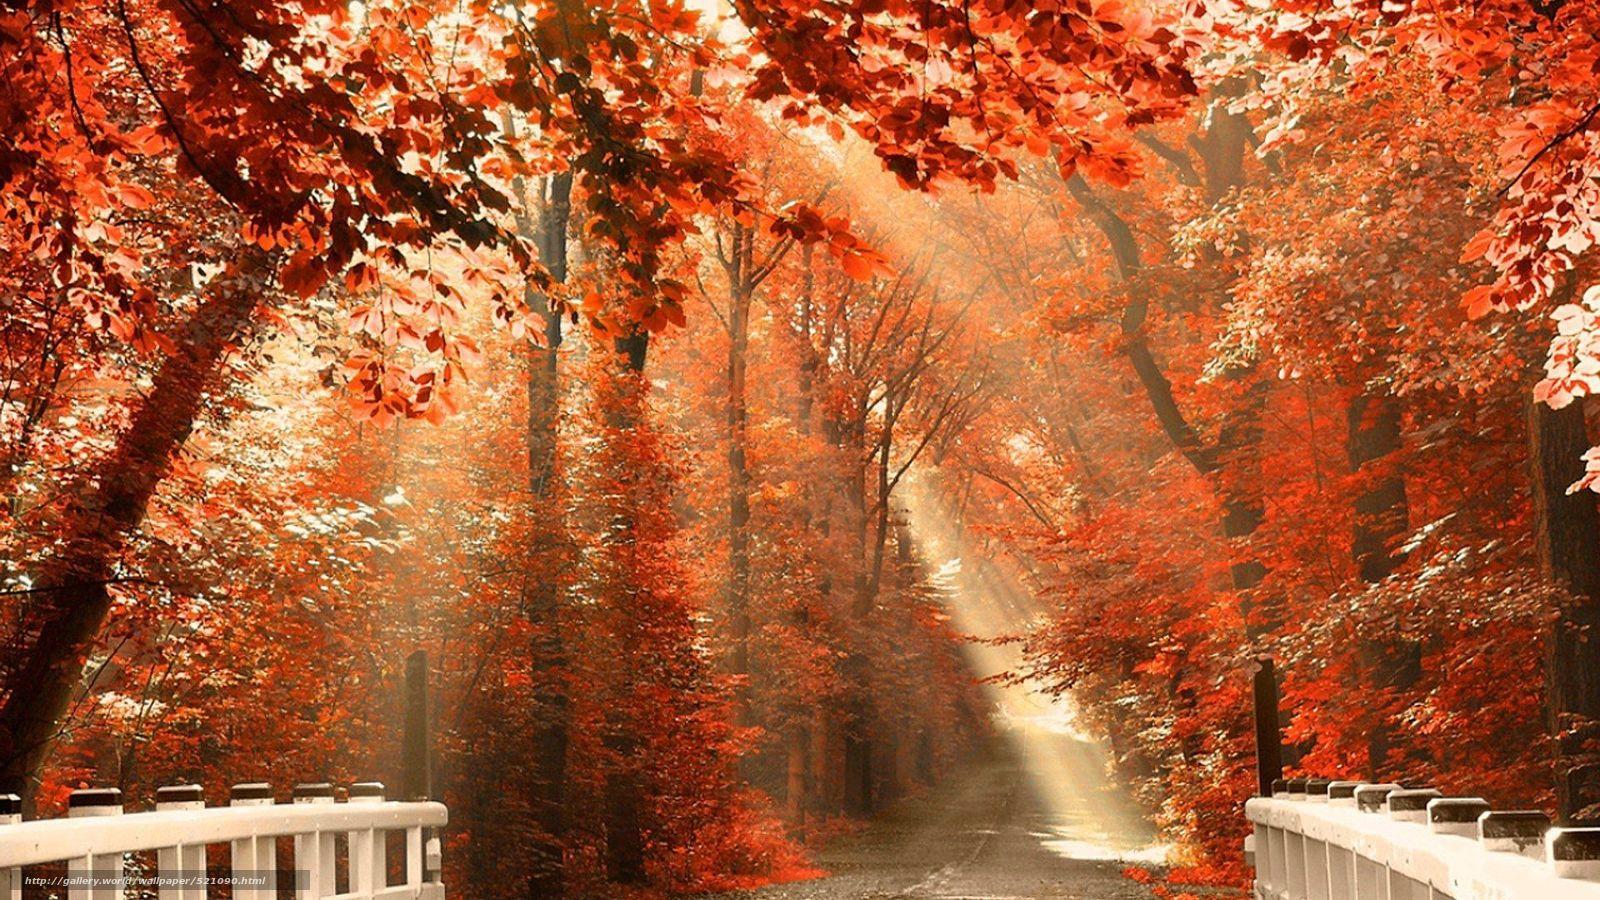 ADM979 HQ Definition Free Desktop Wallpaper Autumn Scenery, Autumn